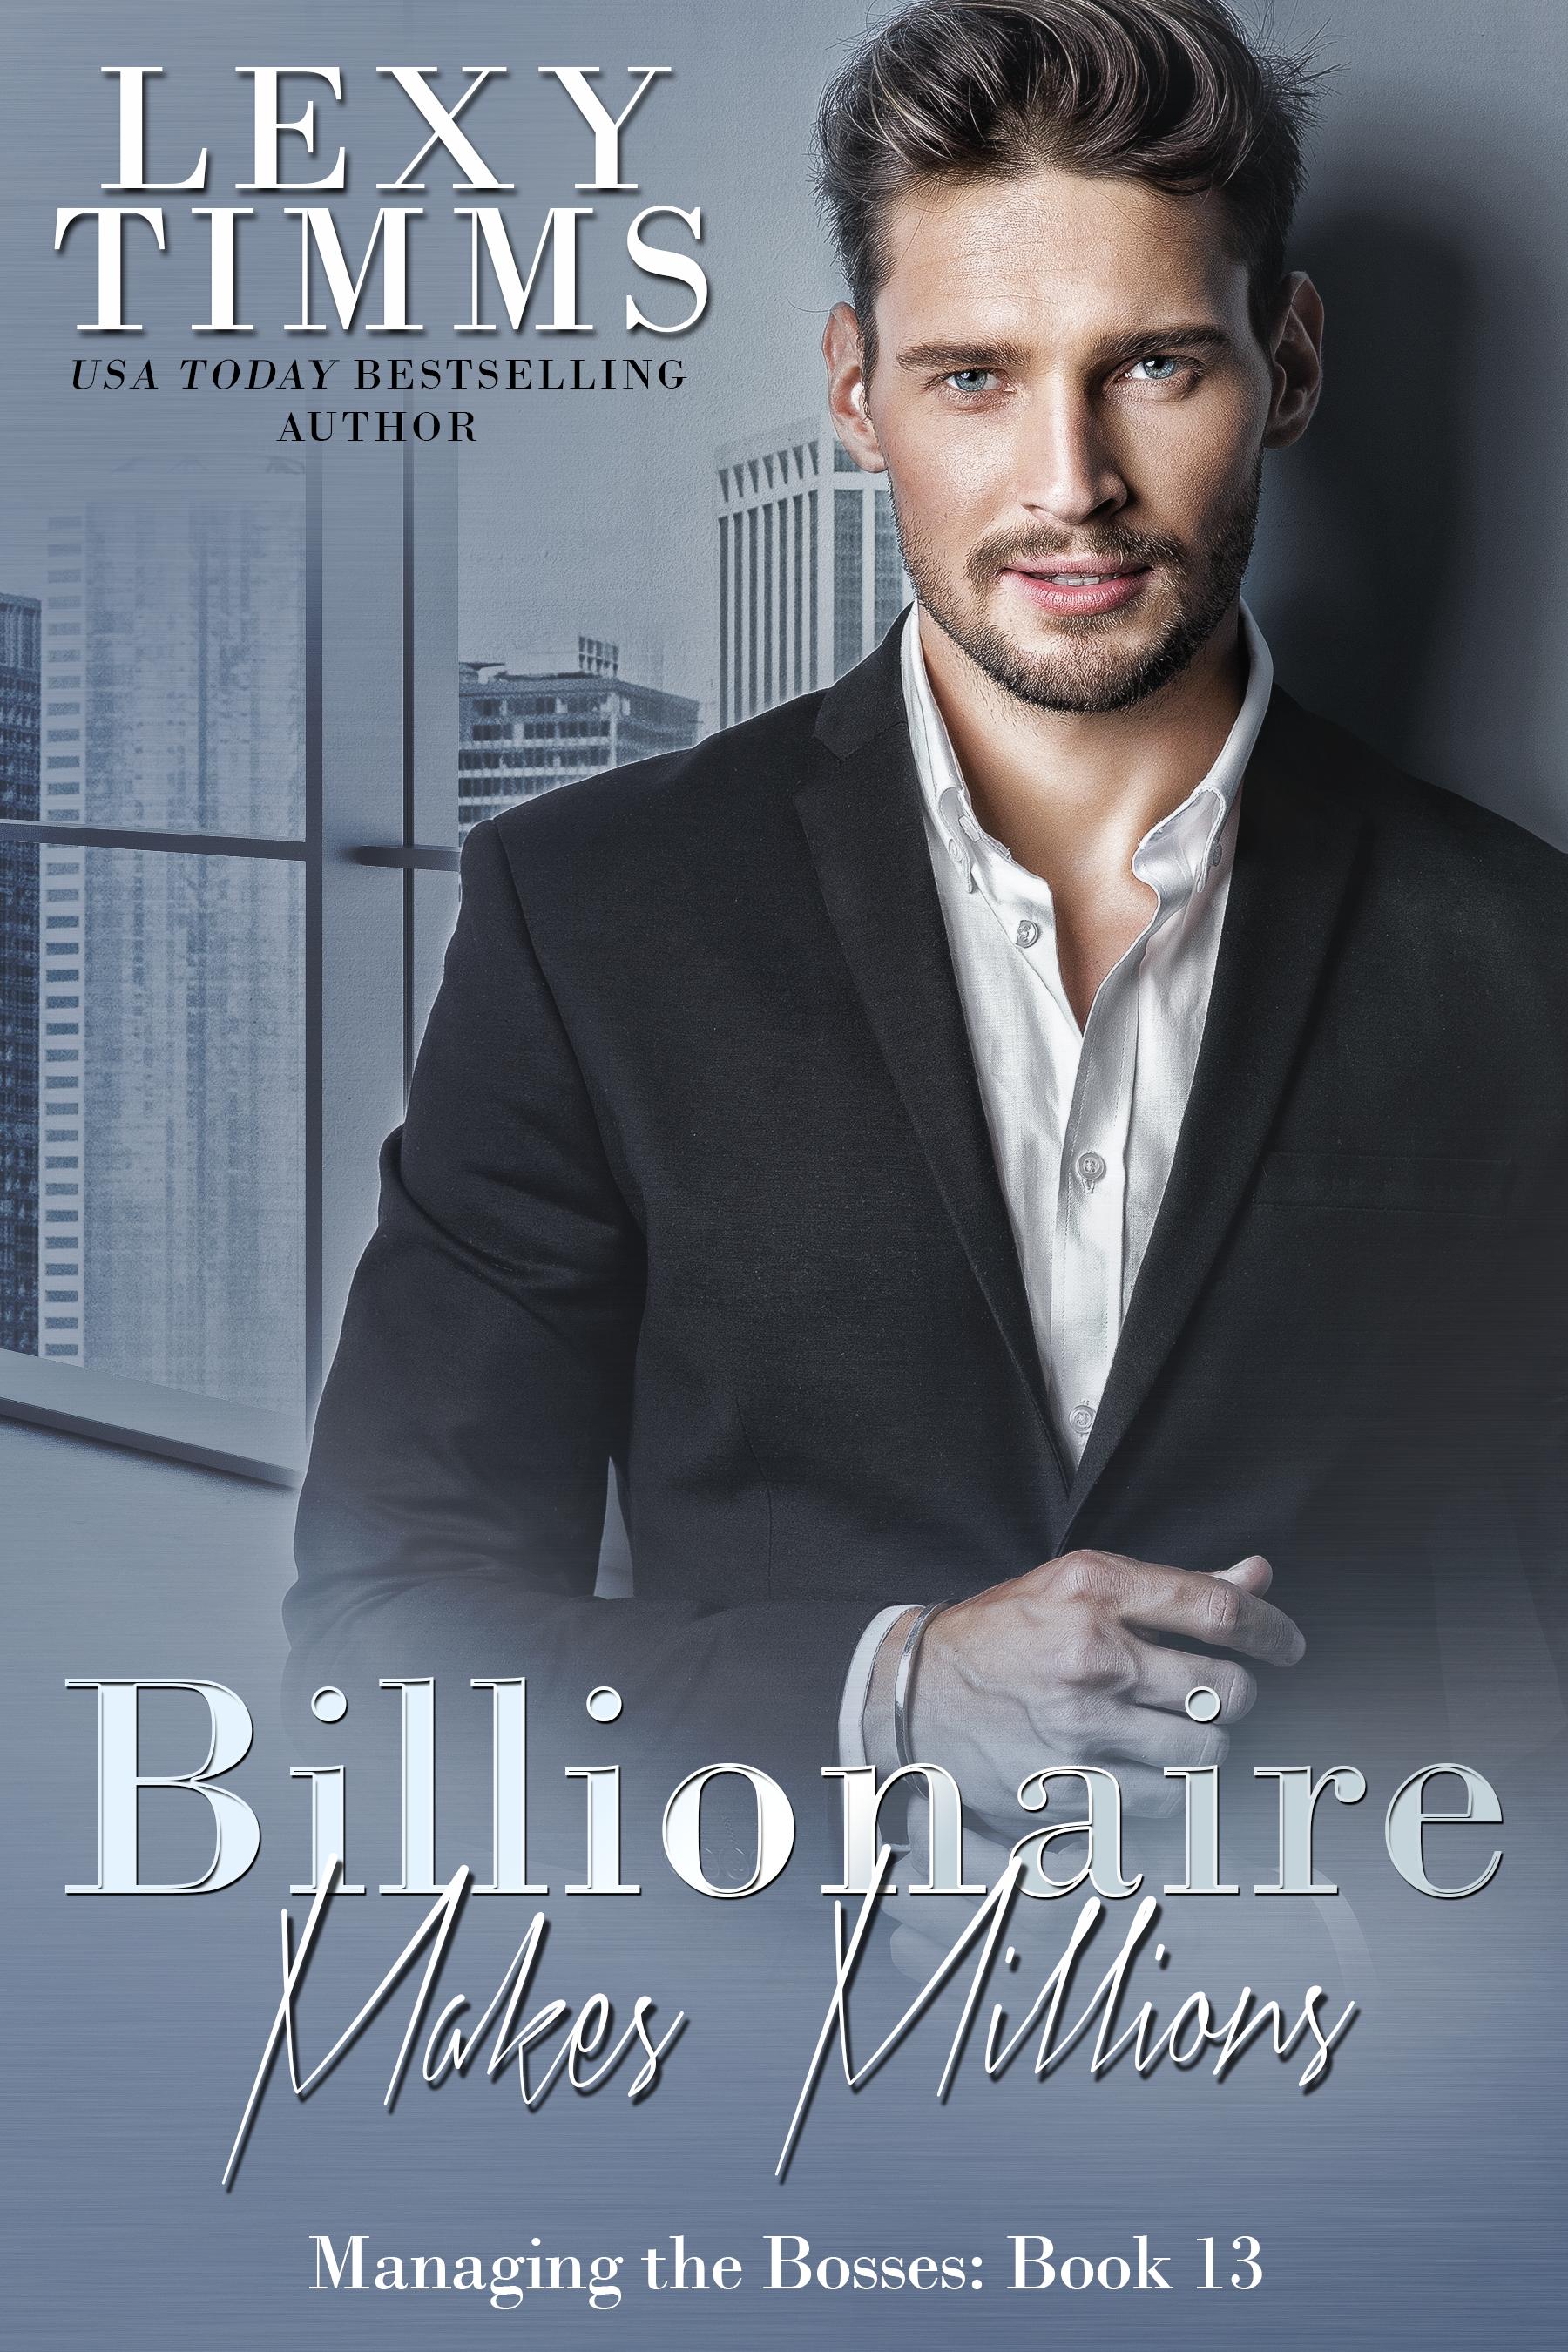 Billionaire makes millions